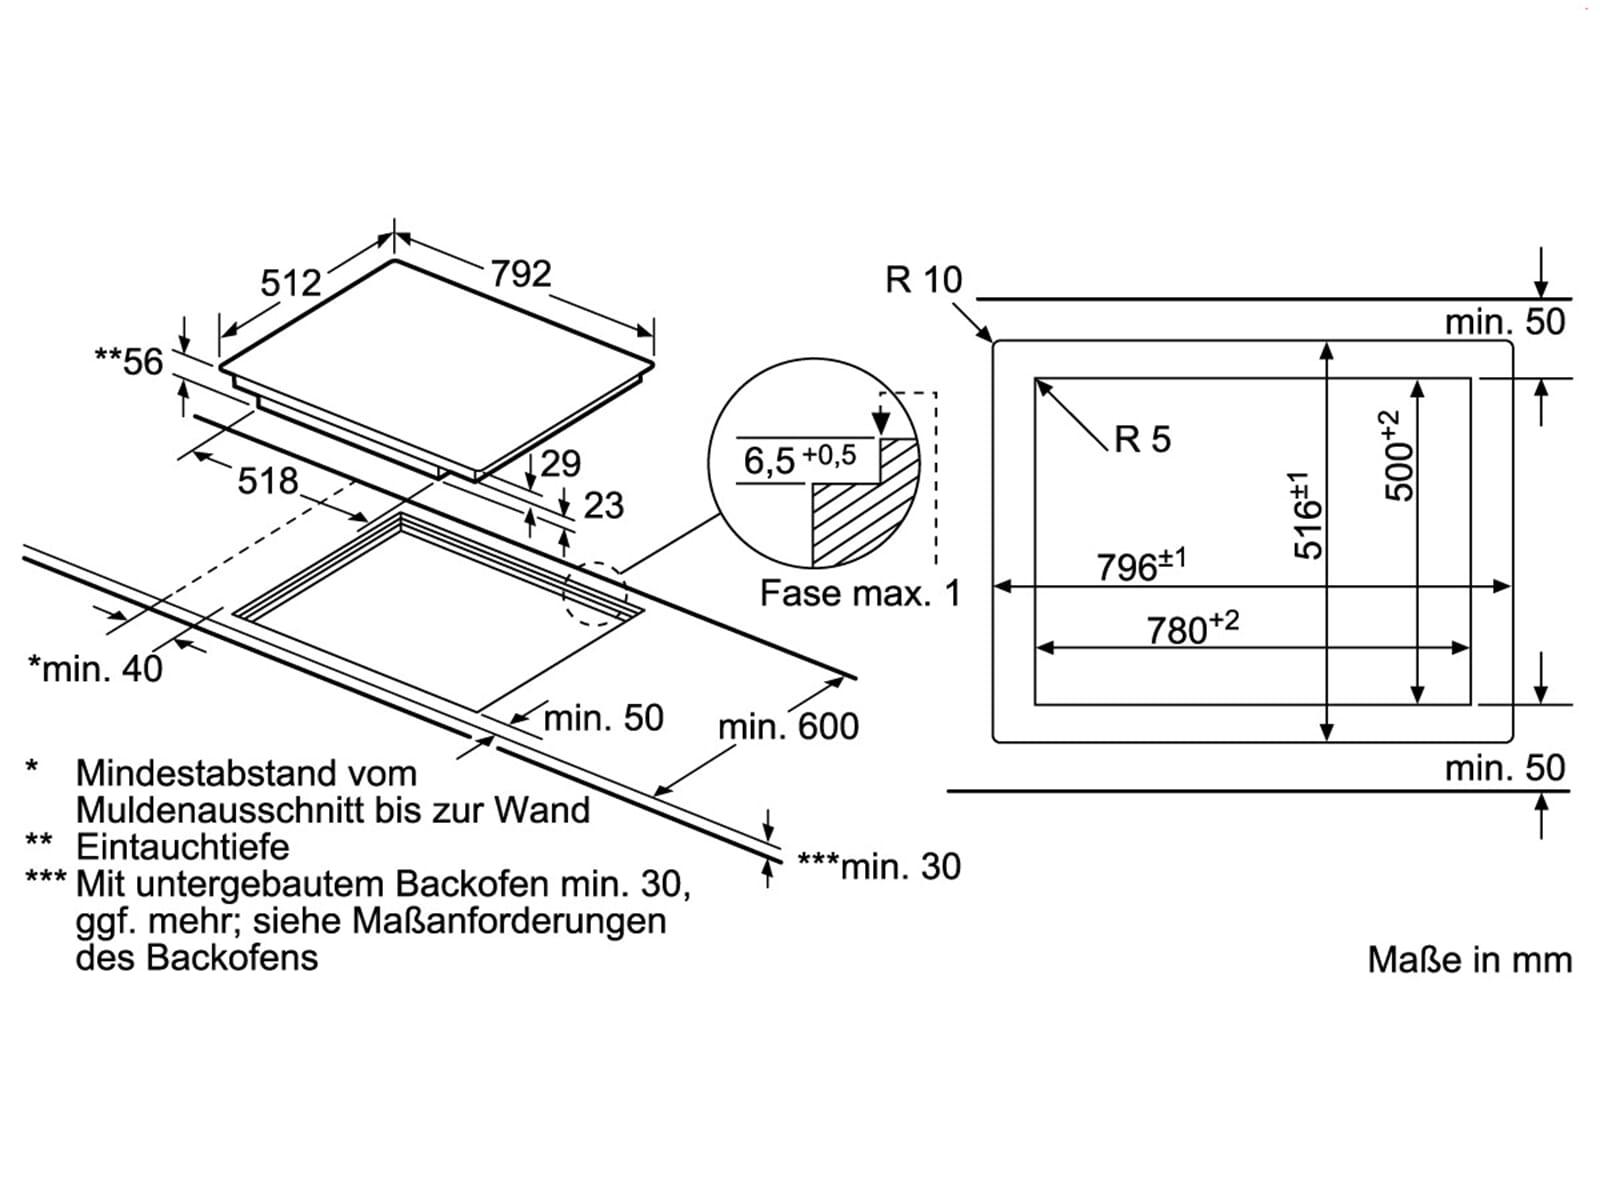 siemens ex801lyc1e induktion glaskeramik kochfeld autark. Black Bedroom Furniture Sets. Home Design Ideas